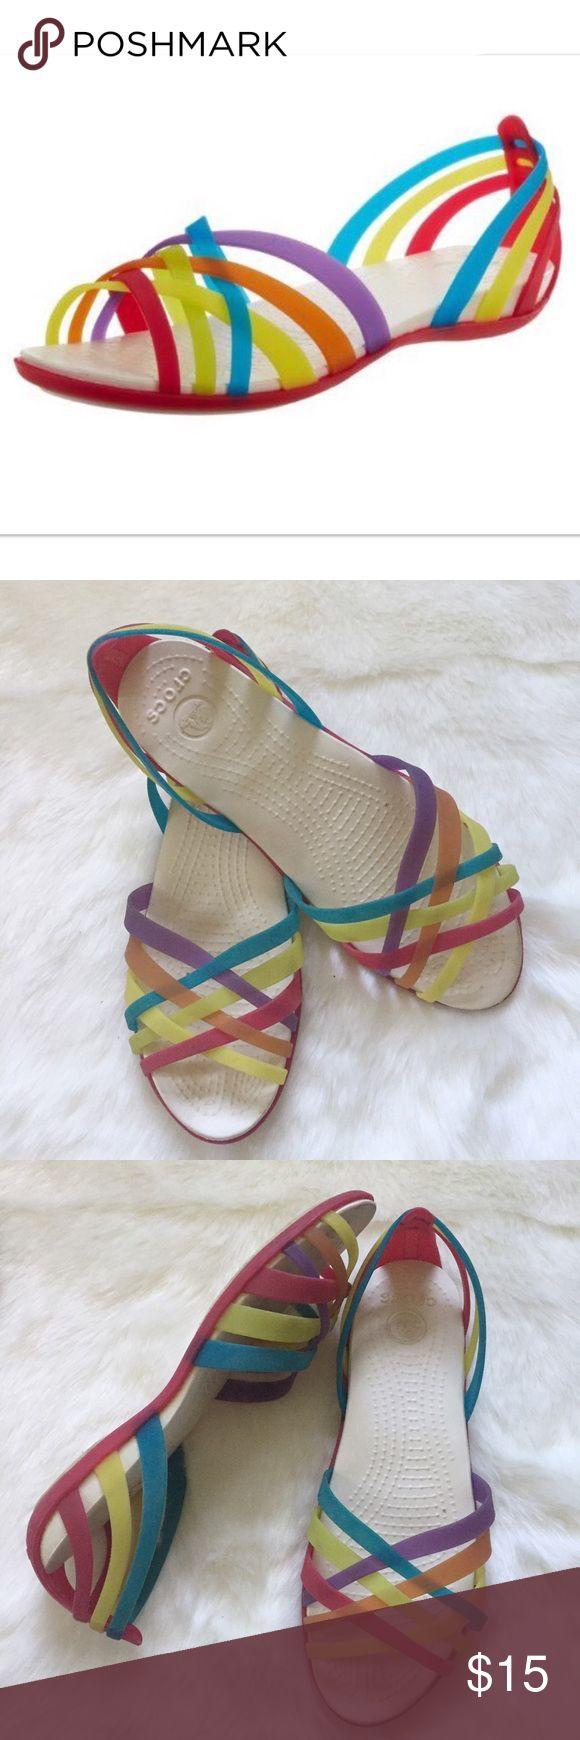 Selling this Crocs Huarache Flats Rainbow Sandals on Poshmark! My username is: davias_closet. #shopmycloset #poshmark #fashion #shopping #style #forsale #CROCS #Shoes